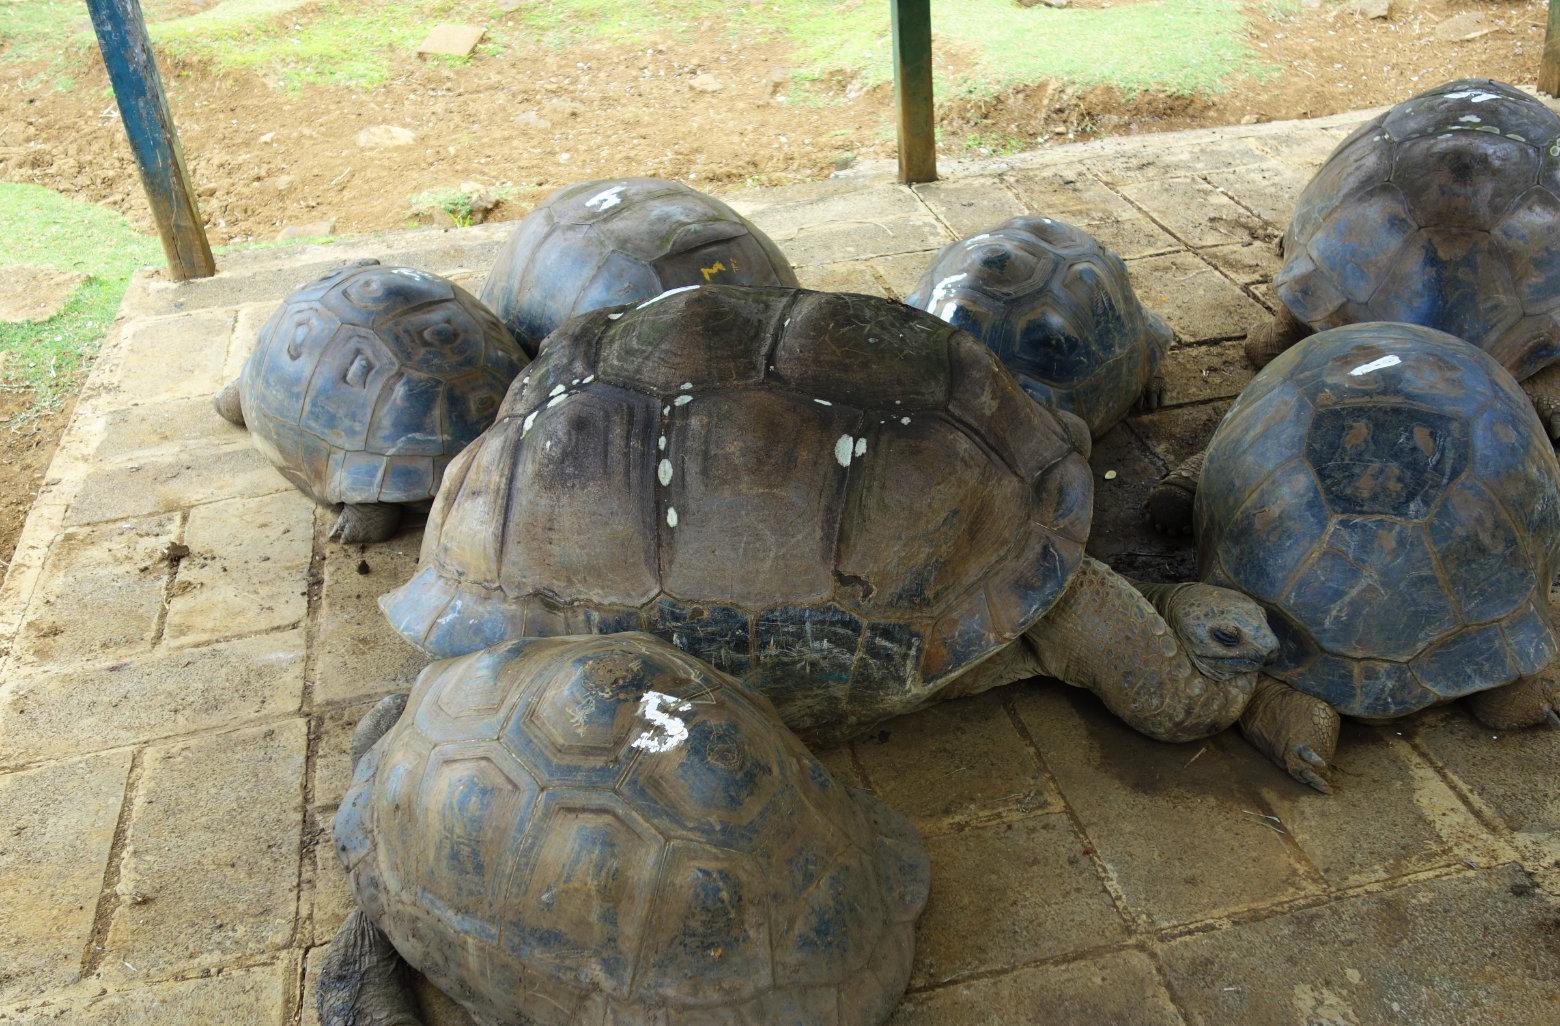 Botanischer Garten Riesenschildkröten